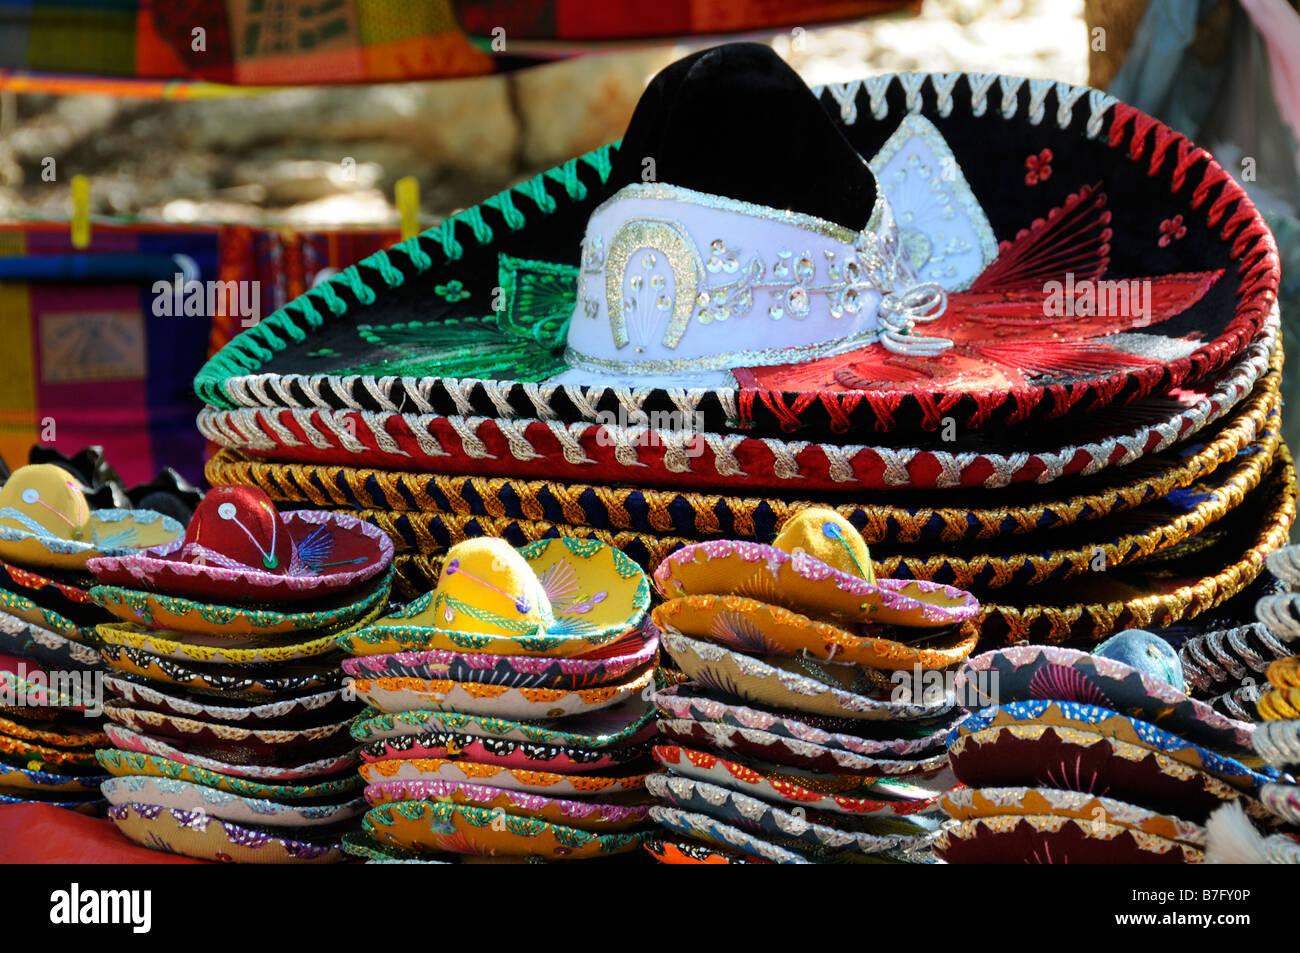 Pilas de sombreros Mexicanos e8f449f96d9